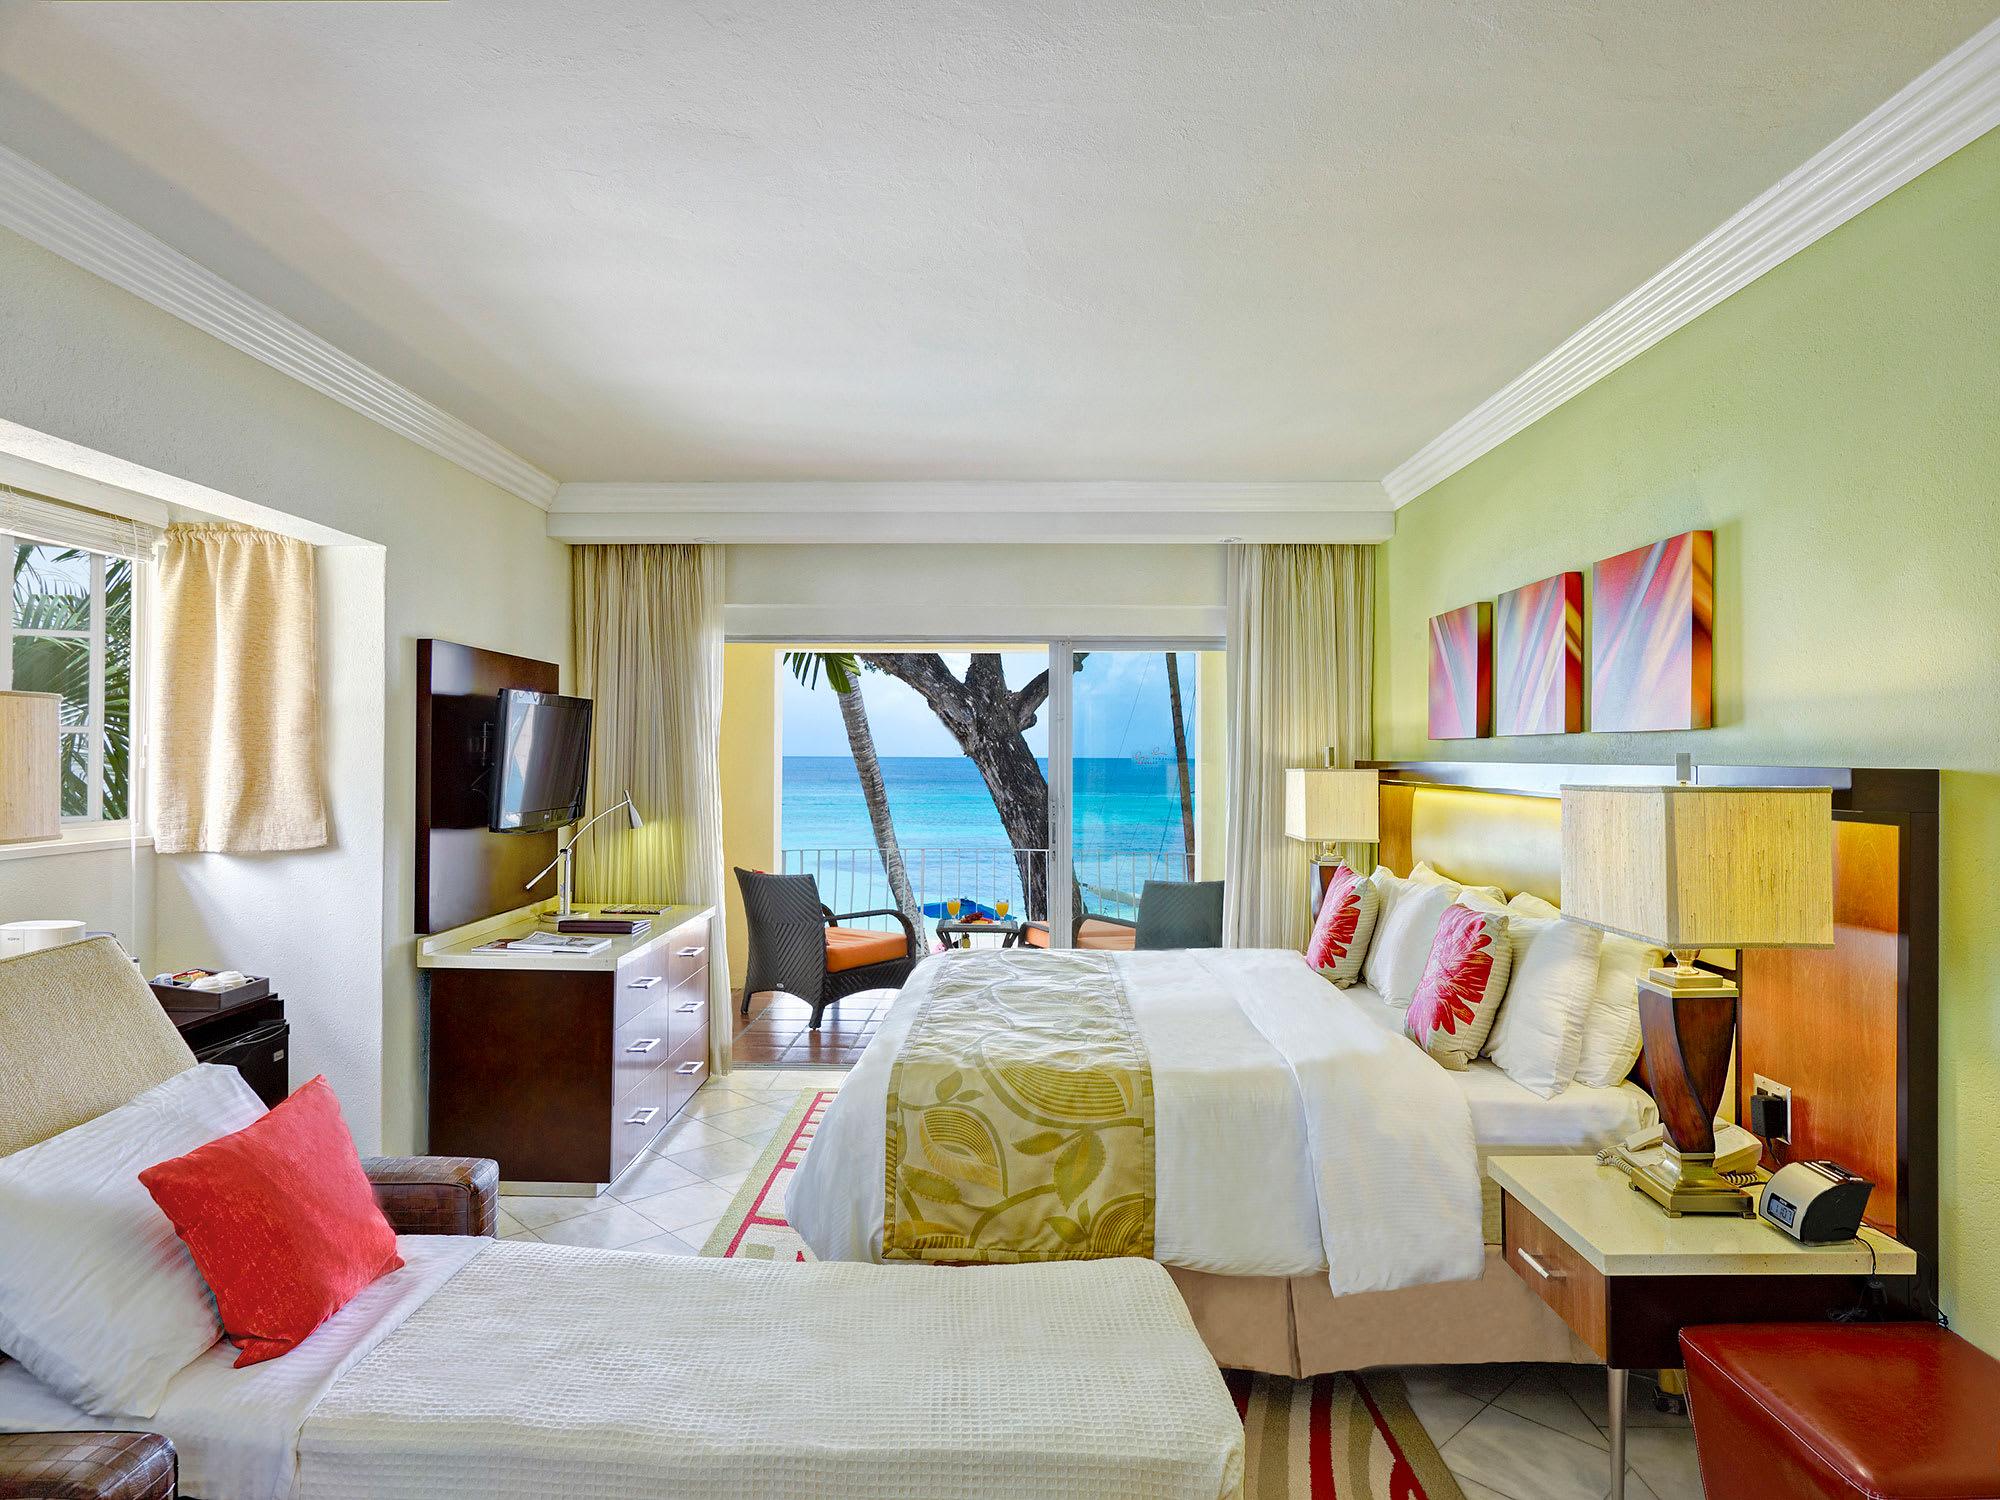 Ocean Front room with sleeper sofa